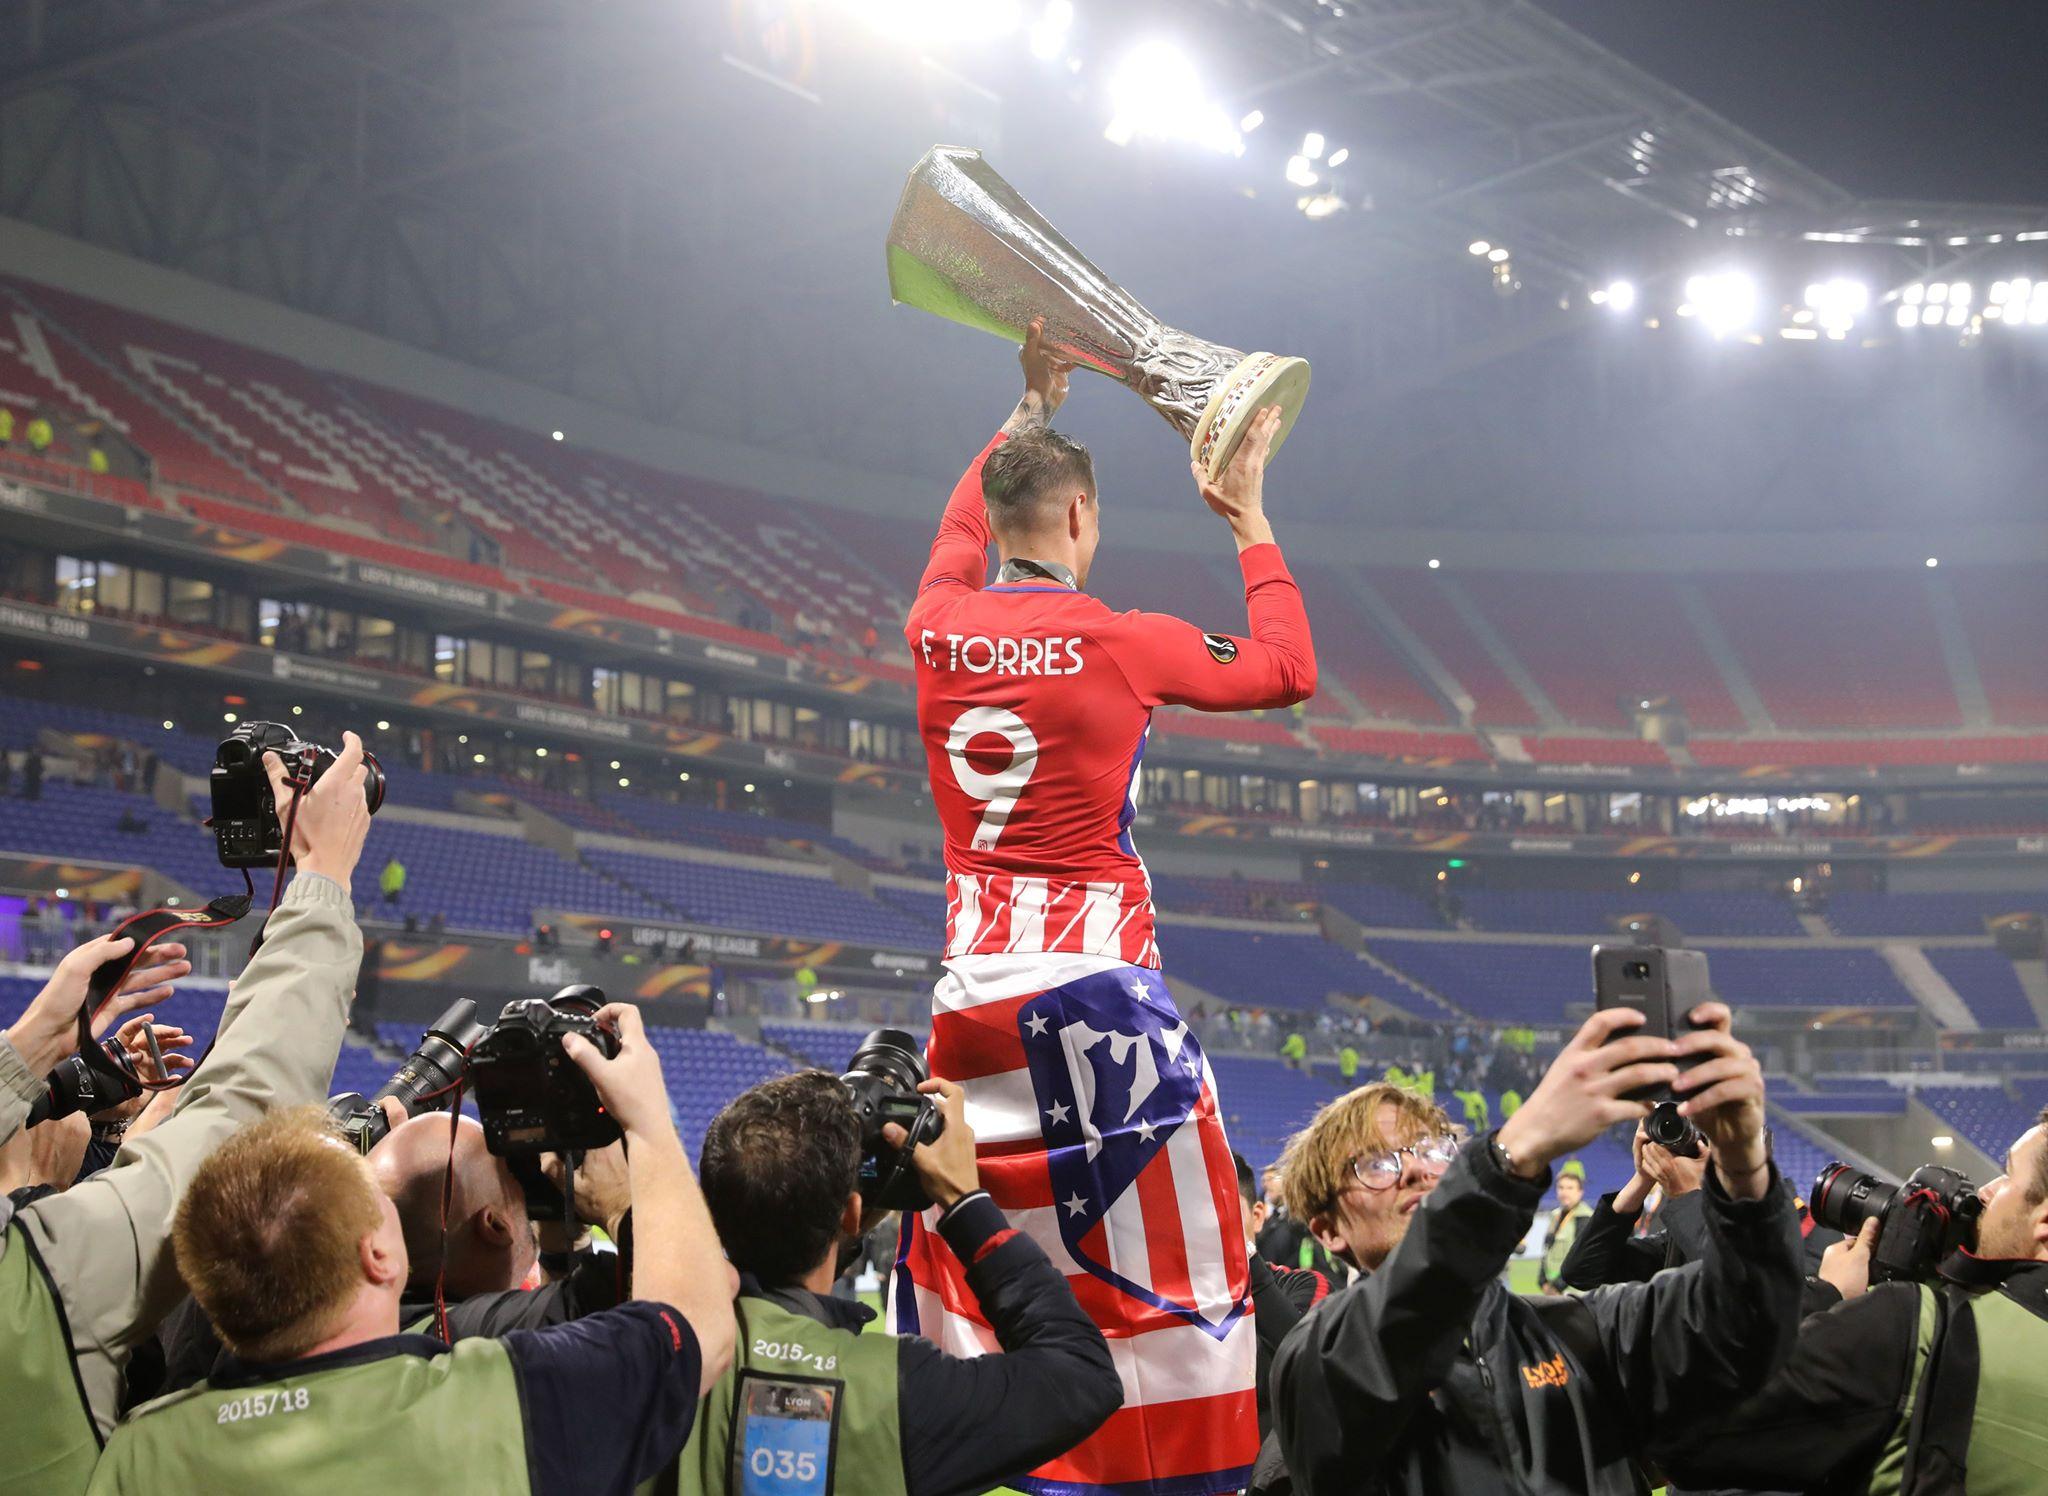 Torres raises silverware. Image: PA